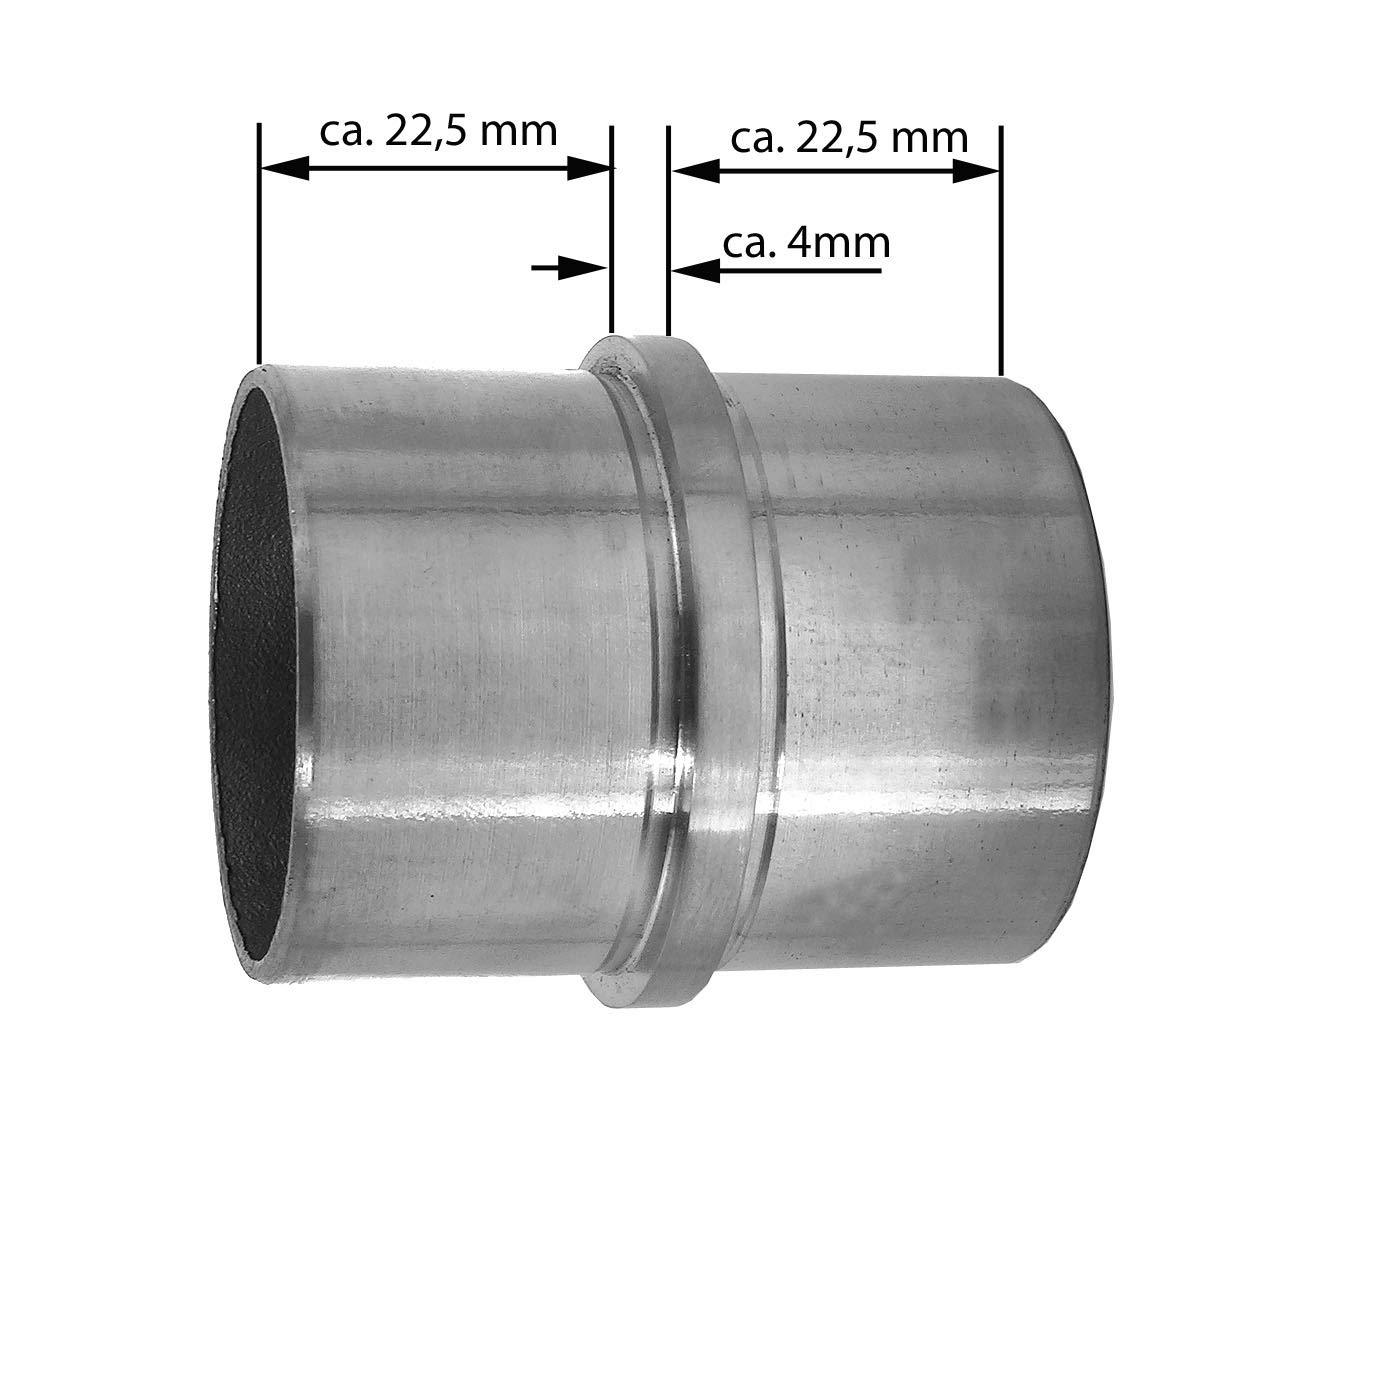 Modell:KA10 Endkappe leicht gew/ölbt Edelstahl Gel/änder Wand Handlauf Tr/äger V2A Treppe Haltegriff /Ø42,4 x 2 mm BASIT